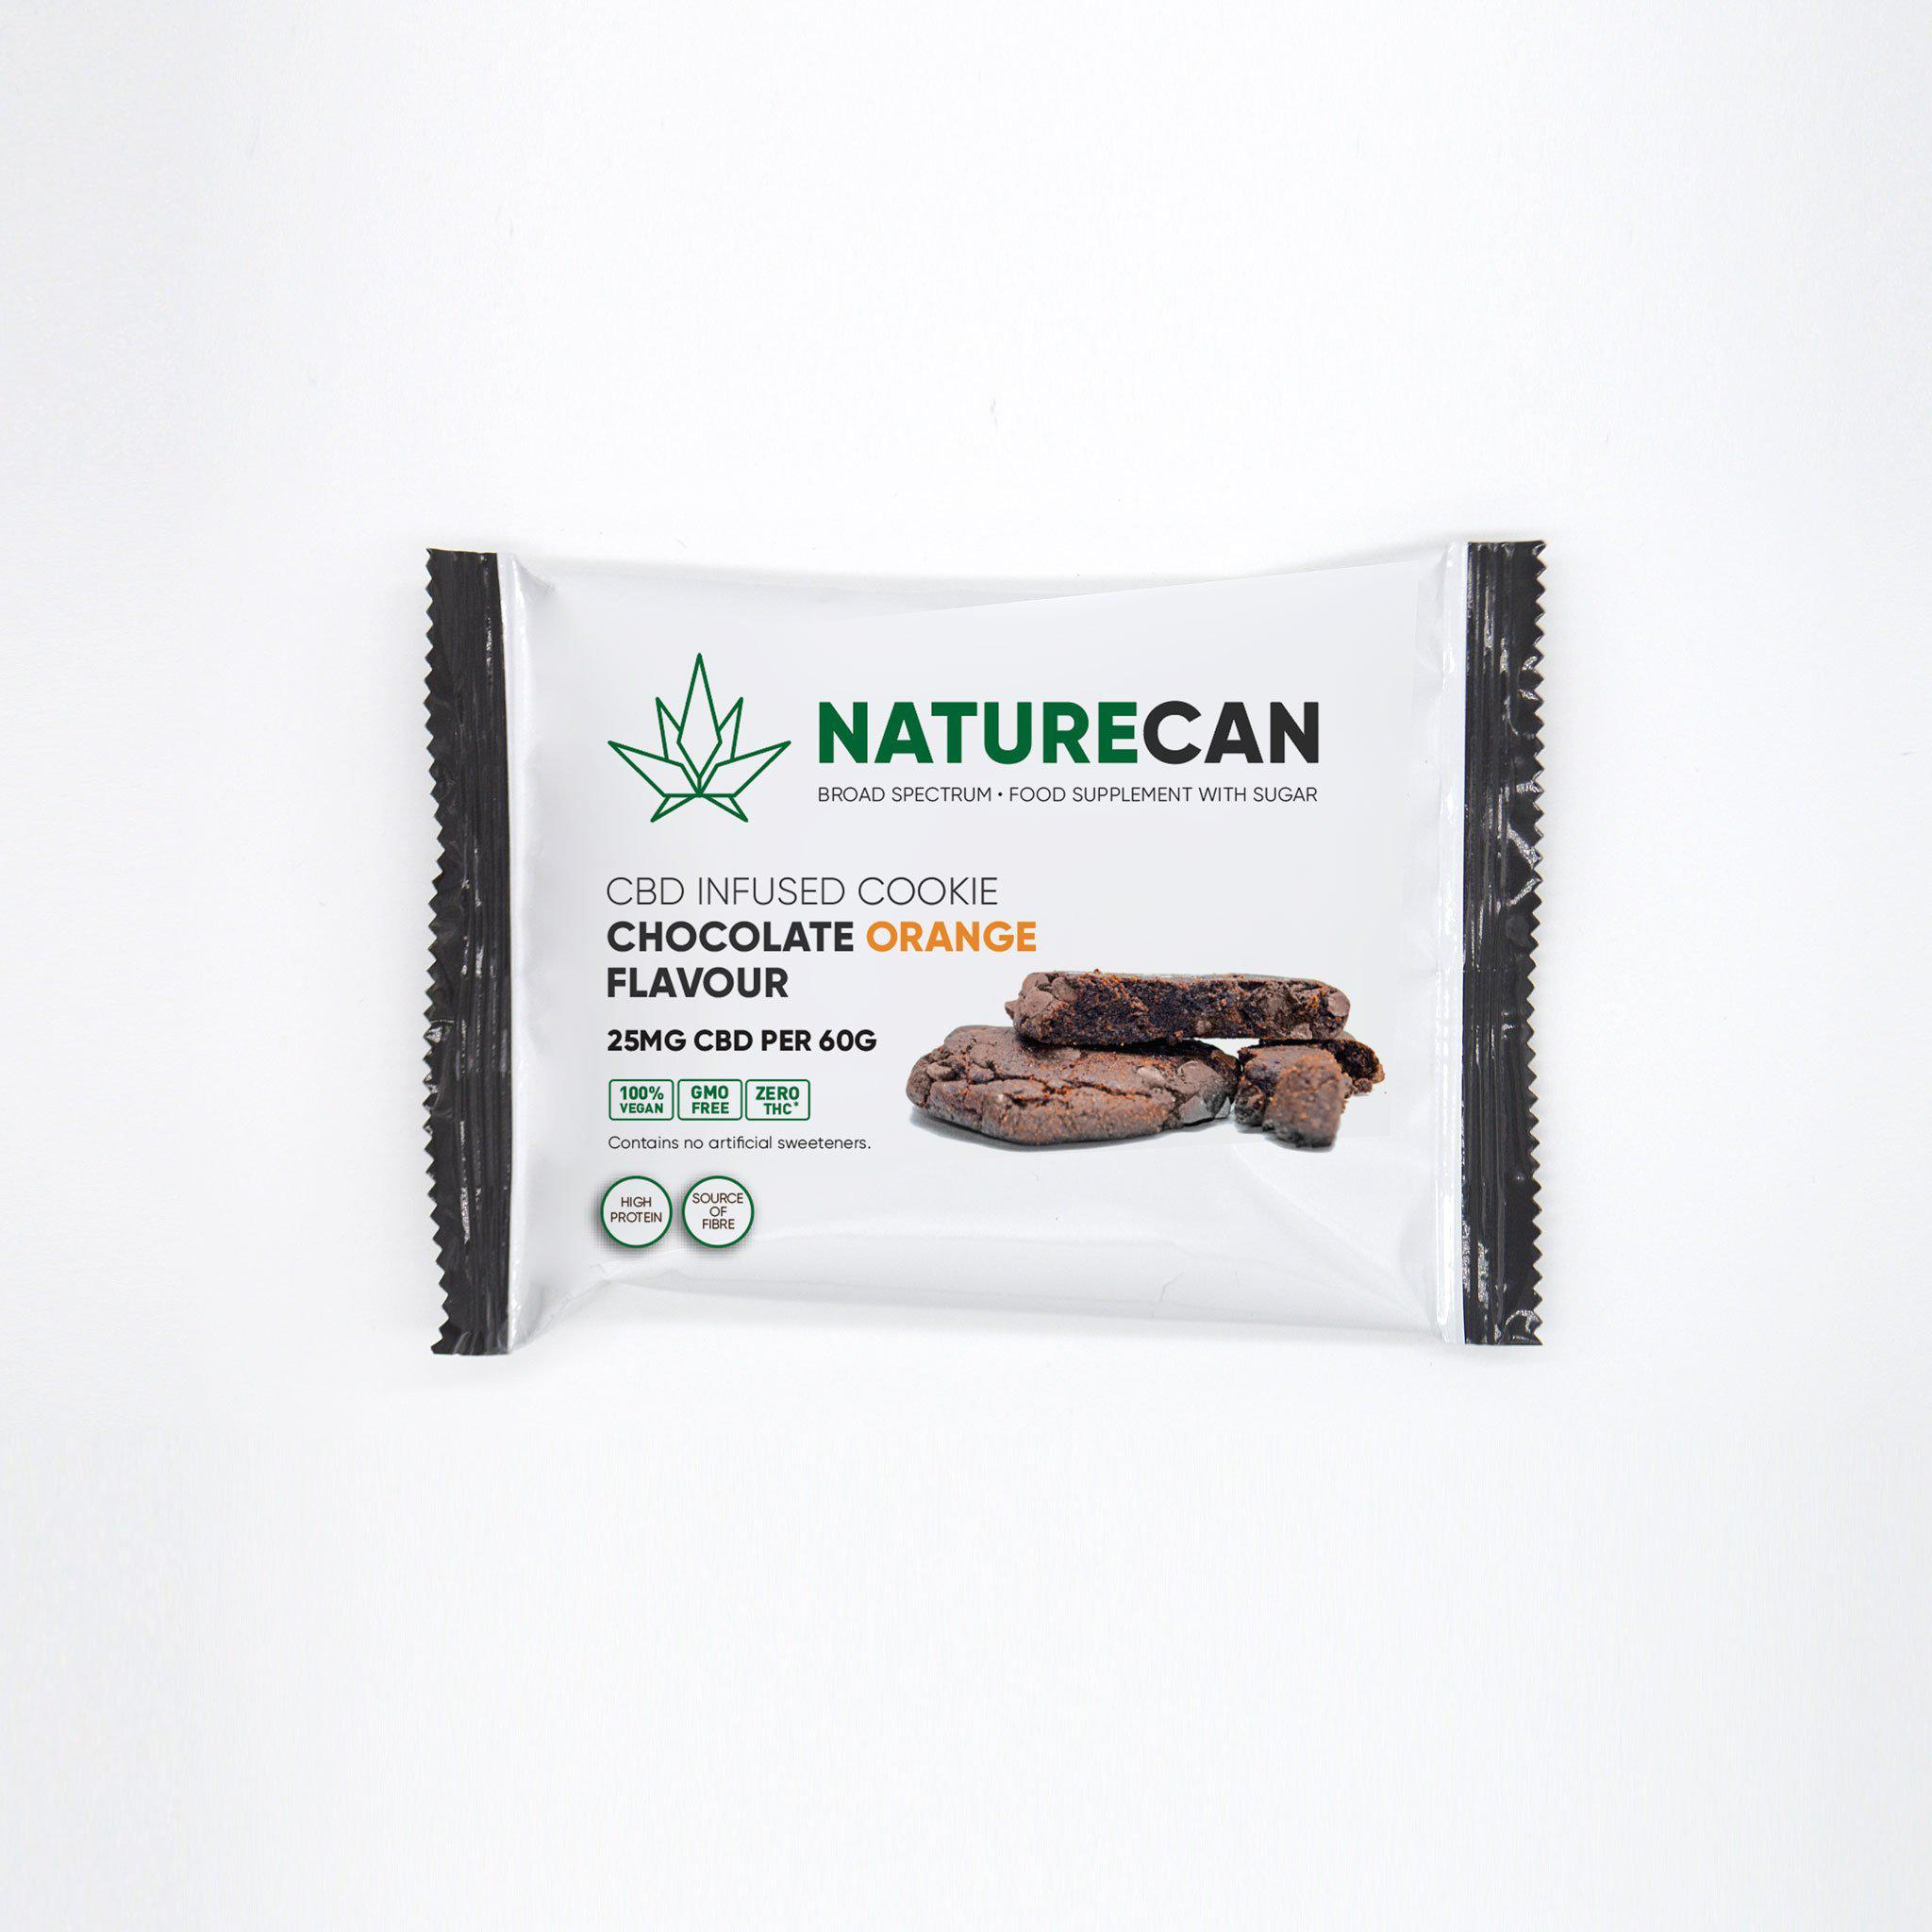 Cookie Schokolade-Orange - Naturecan